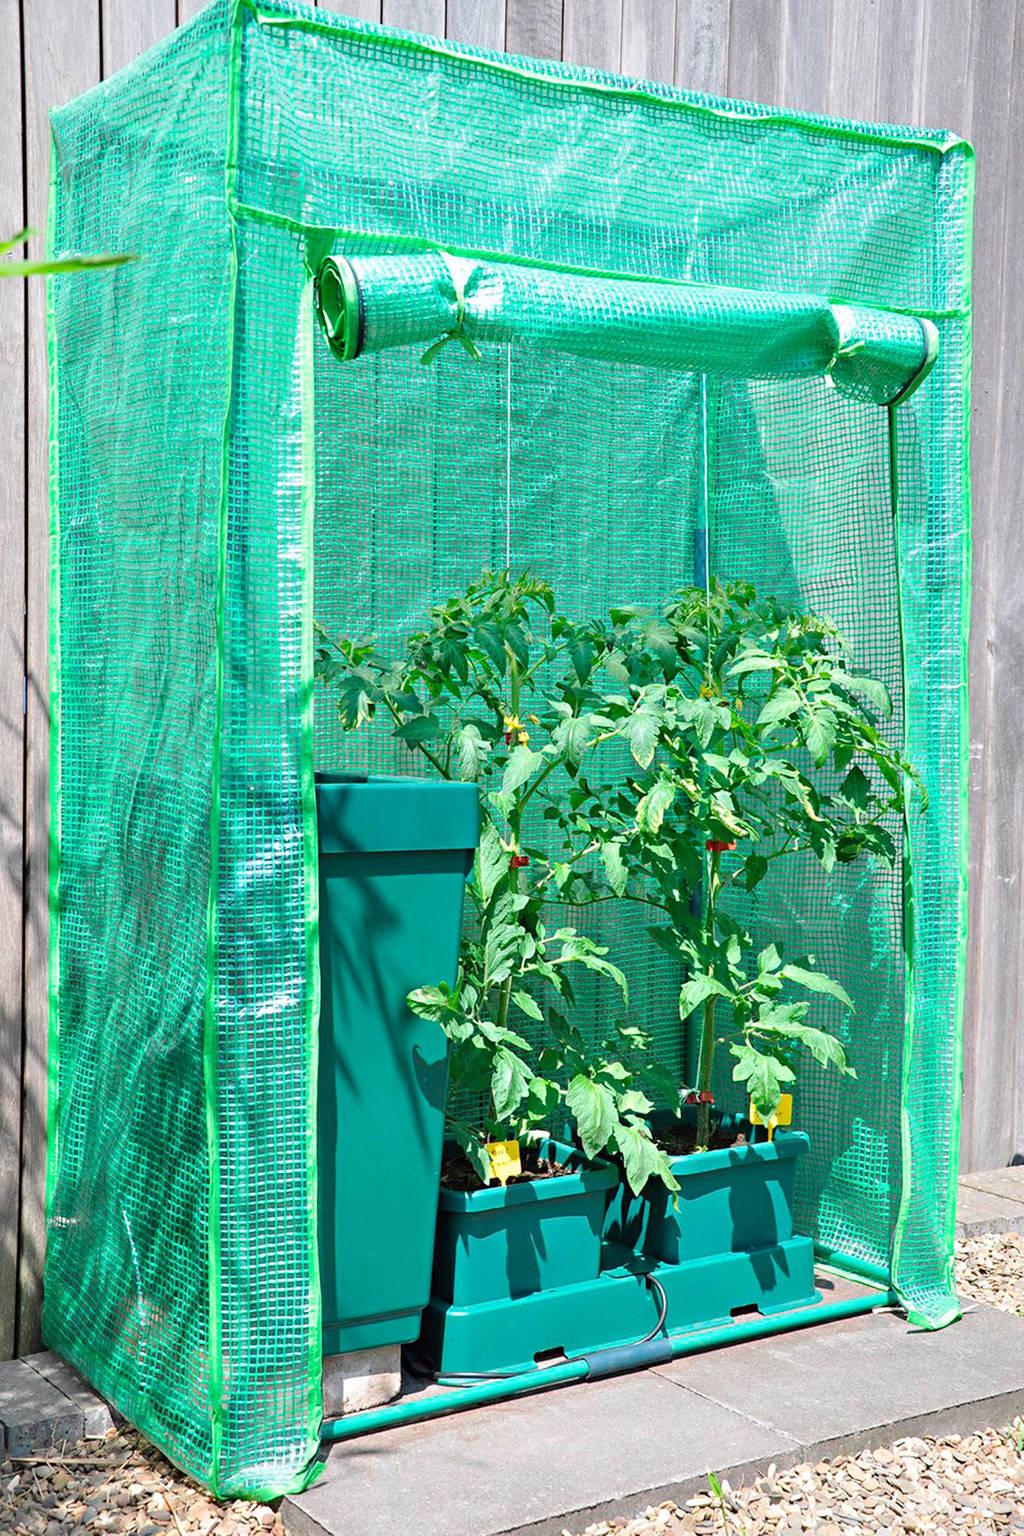 Royal Well foliekas Roma Tomato, Groen